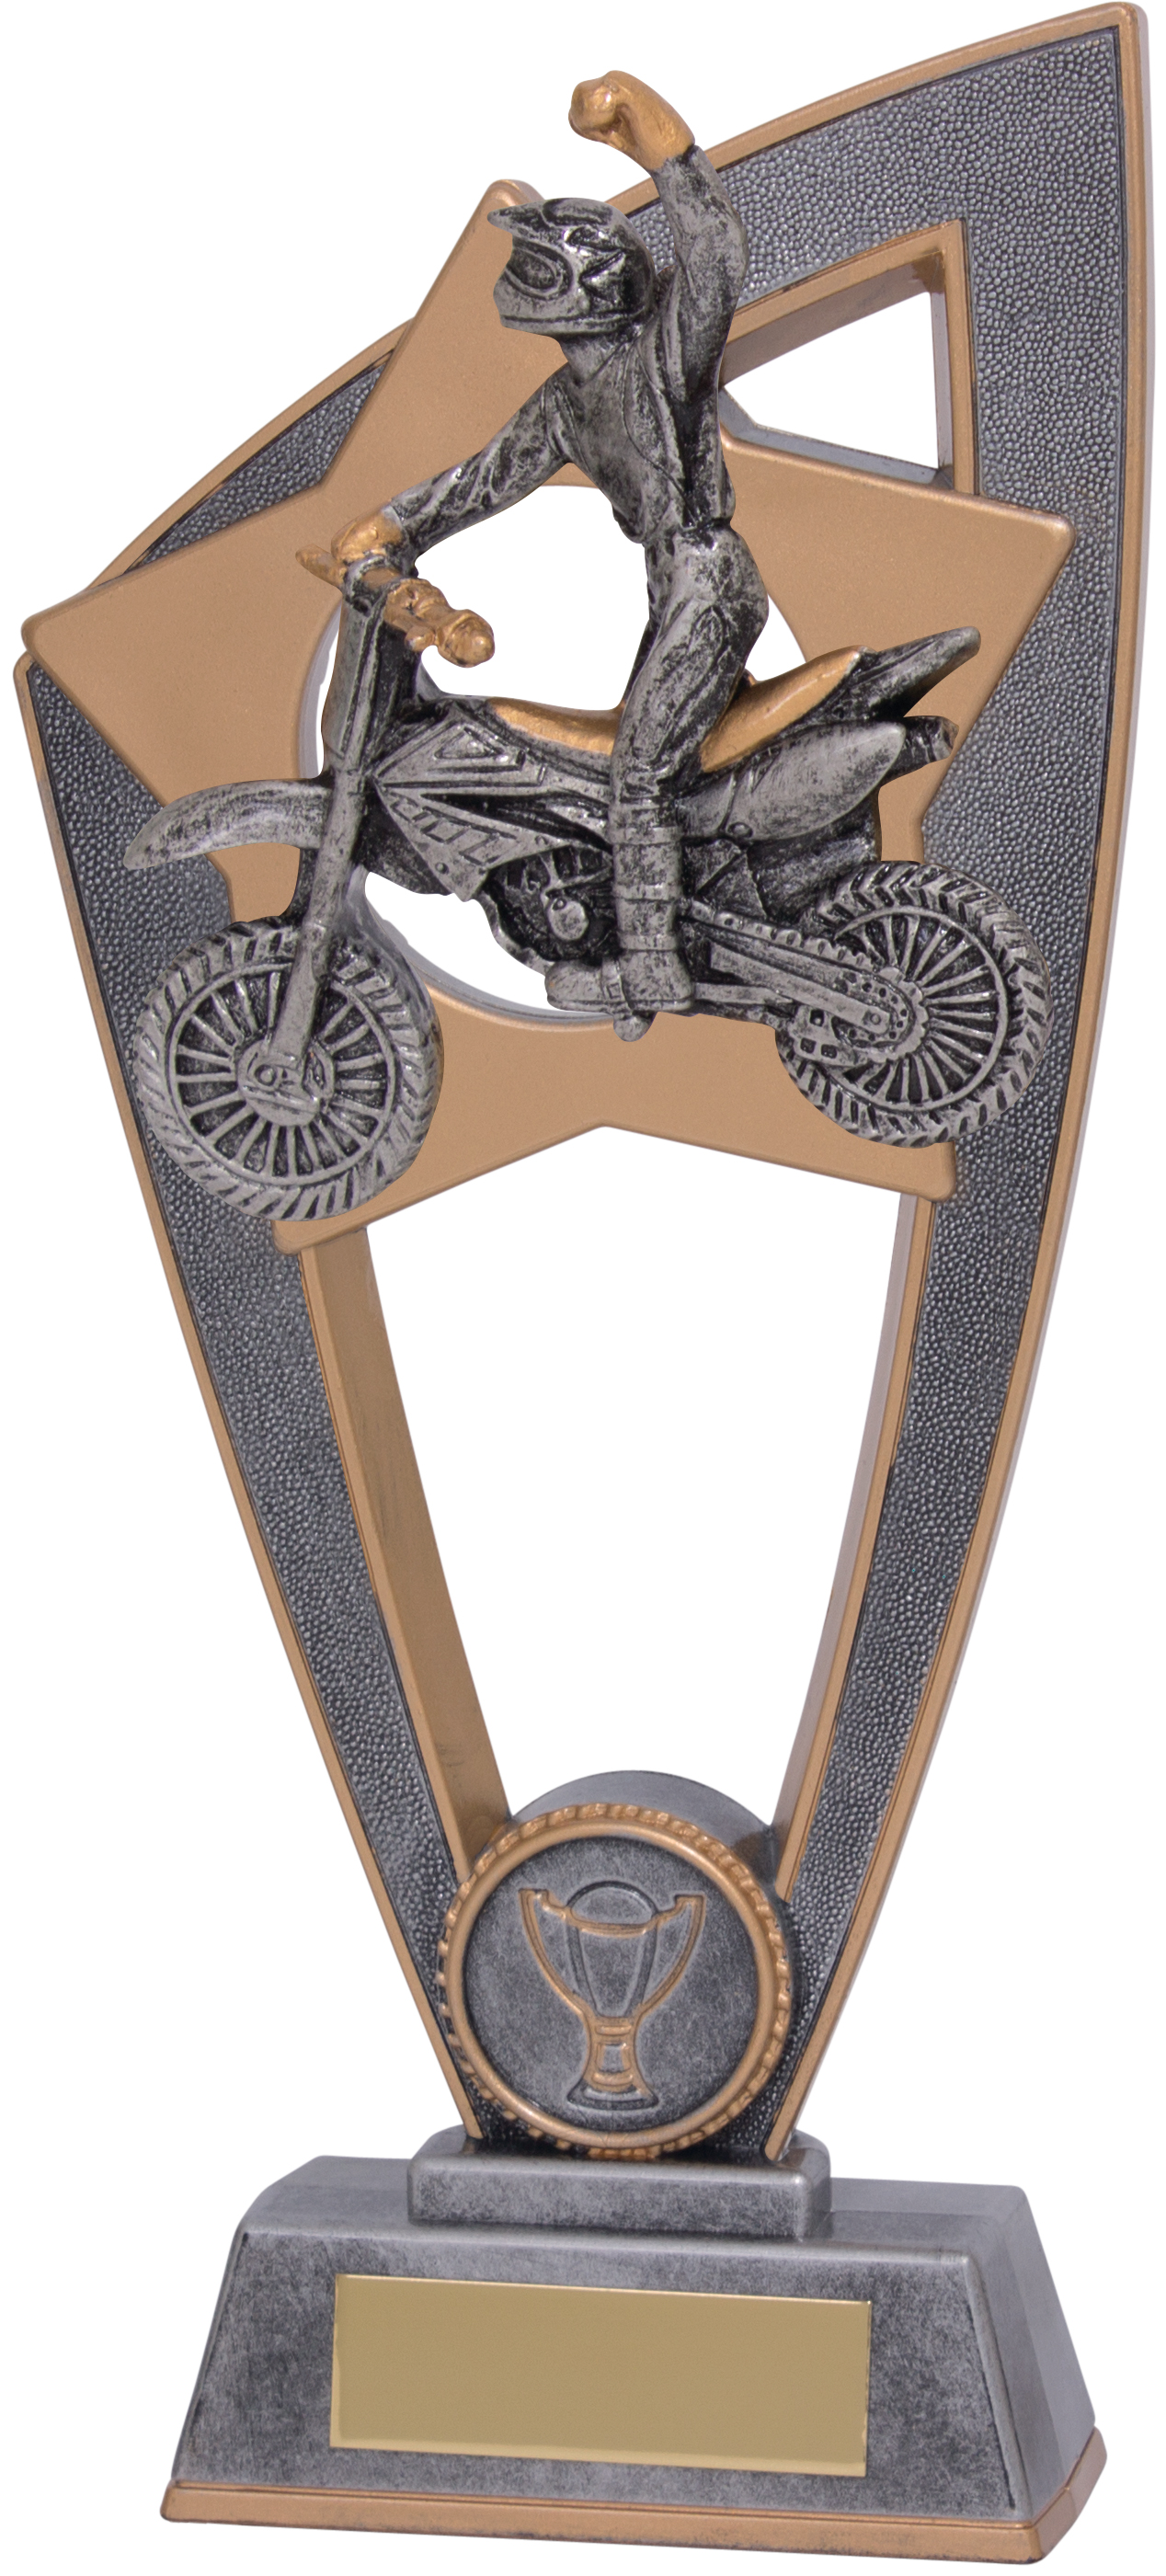 "Motocross Star Blast Trophy 23cm (9"")"